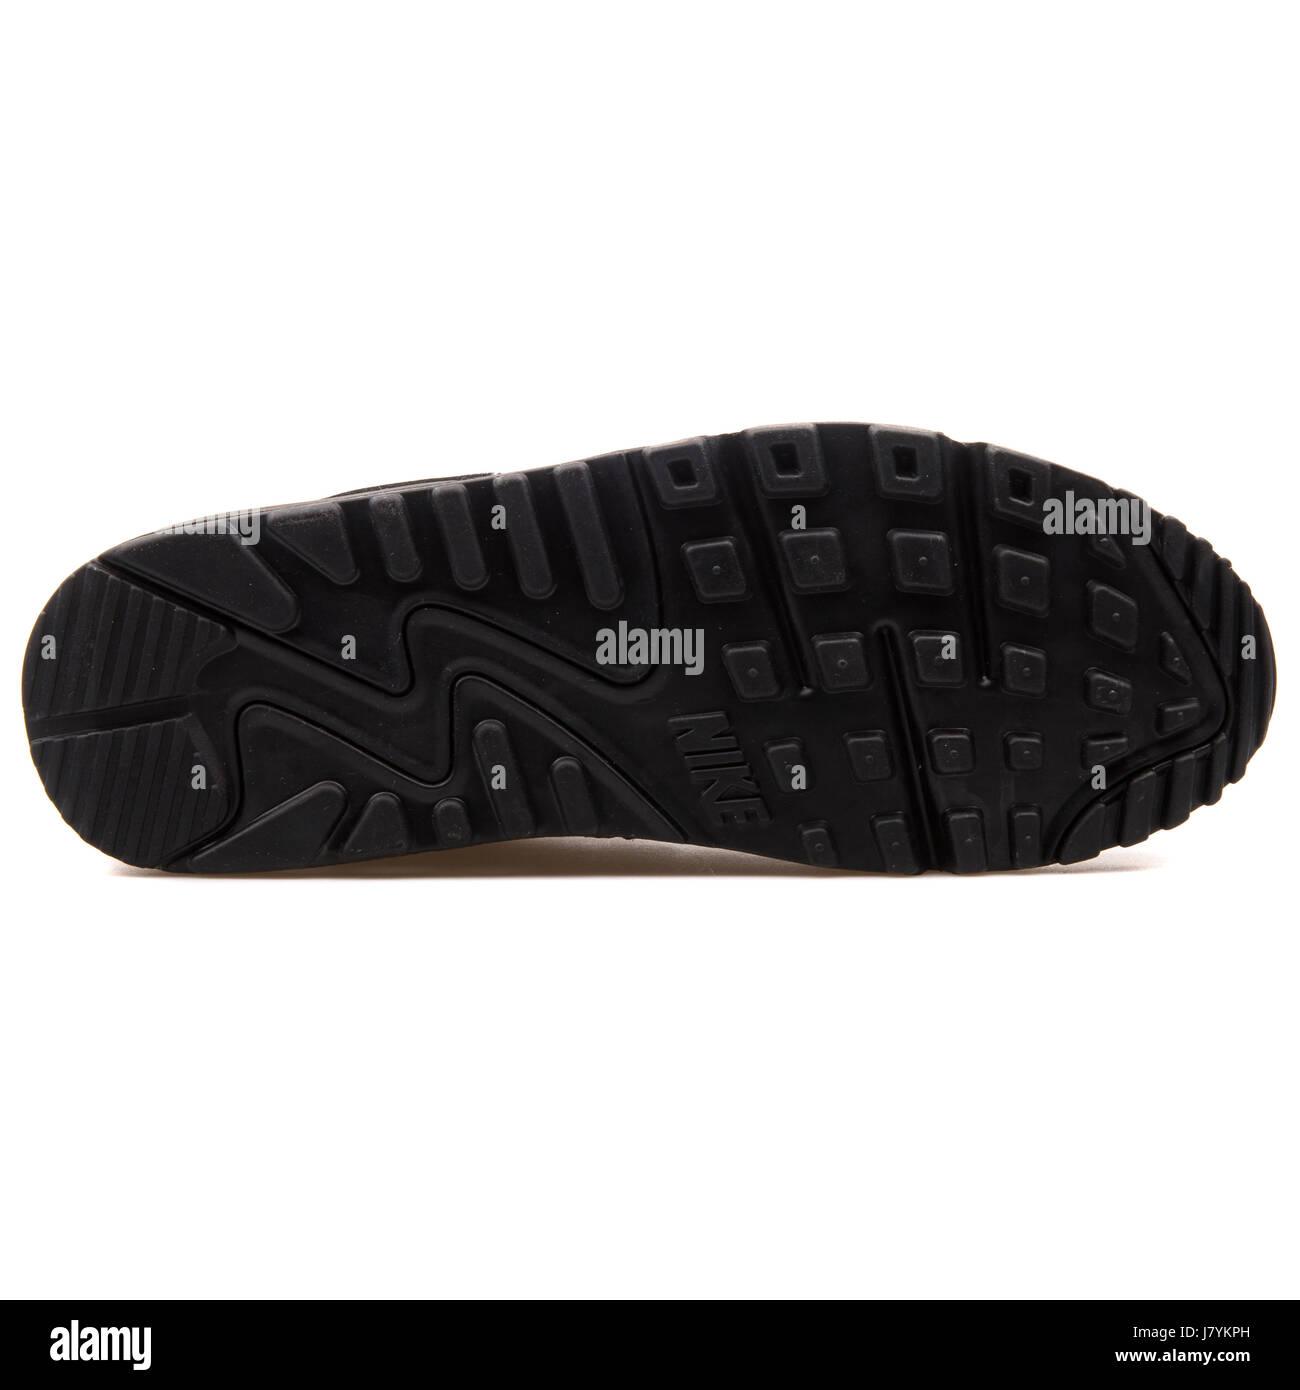 pretty nice 16163 831b1 Nike WMNS Air Max 90 Premium Damen Schwarz glänzend Sneakers - 443817-002  Stockbild